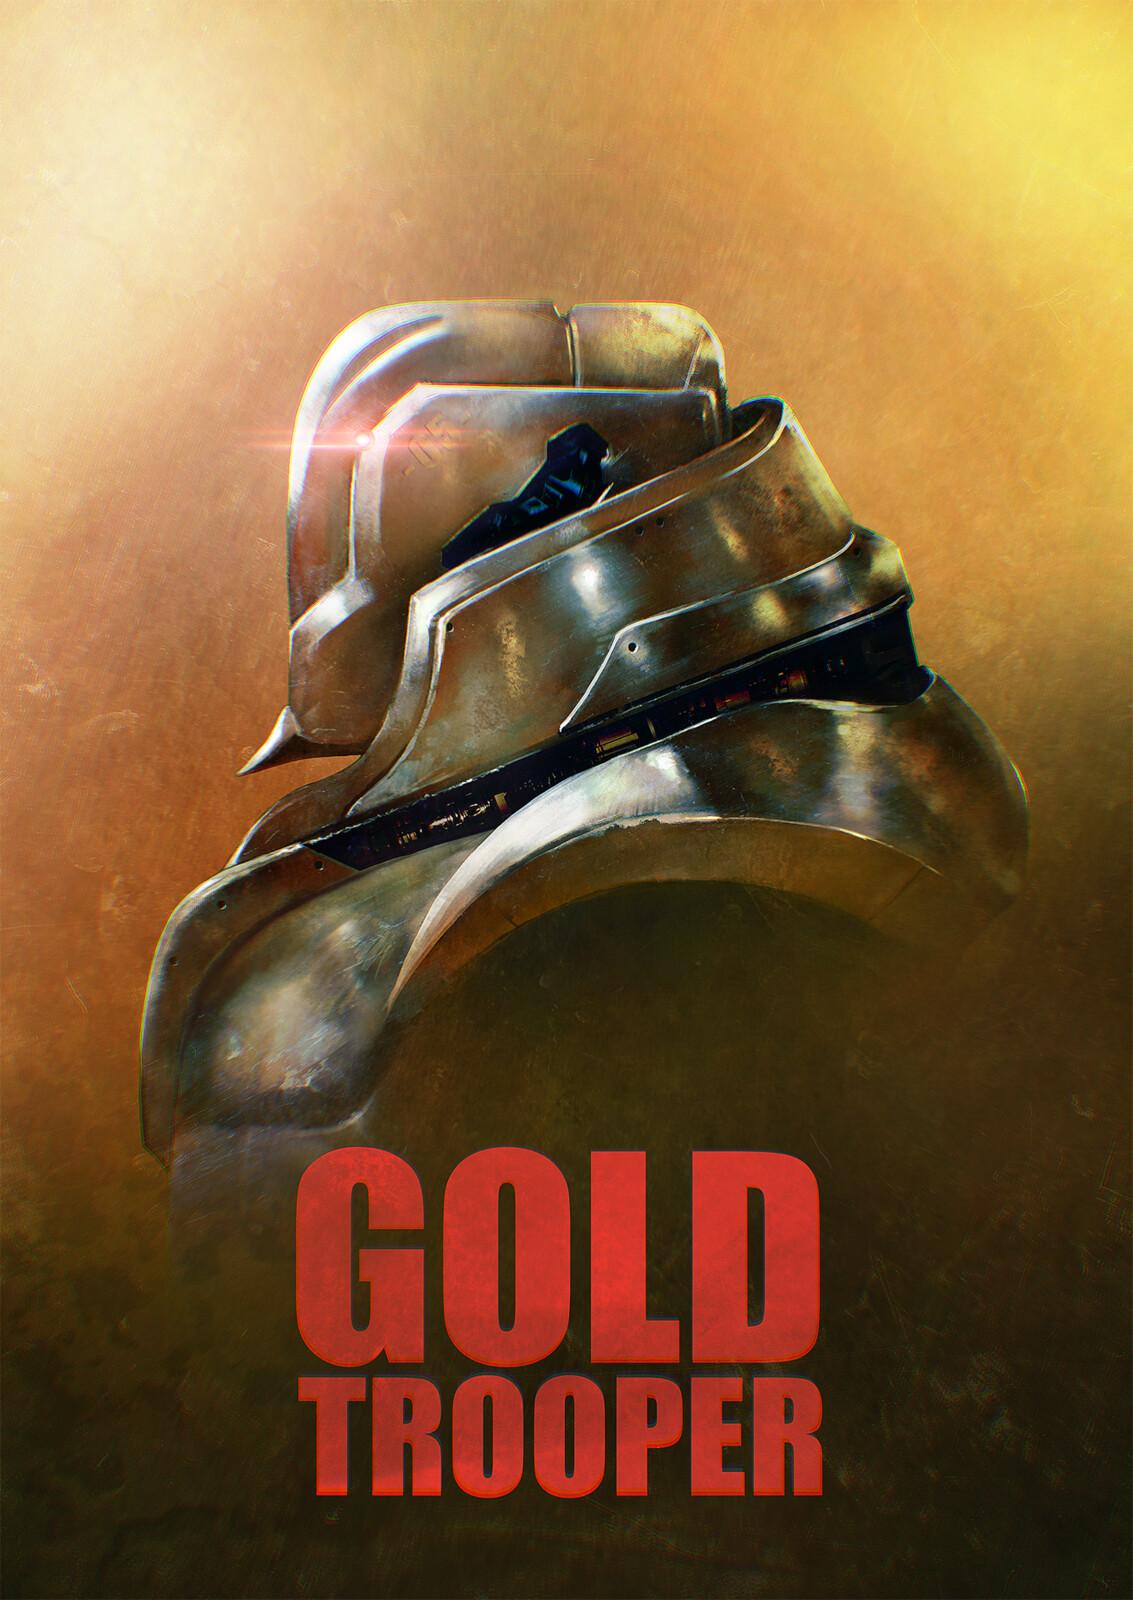 Gold Trooper